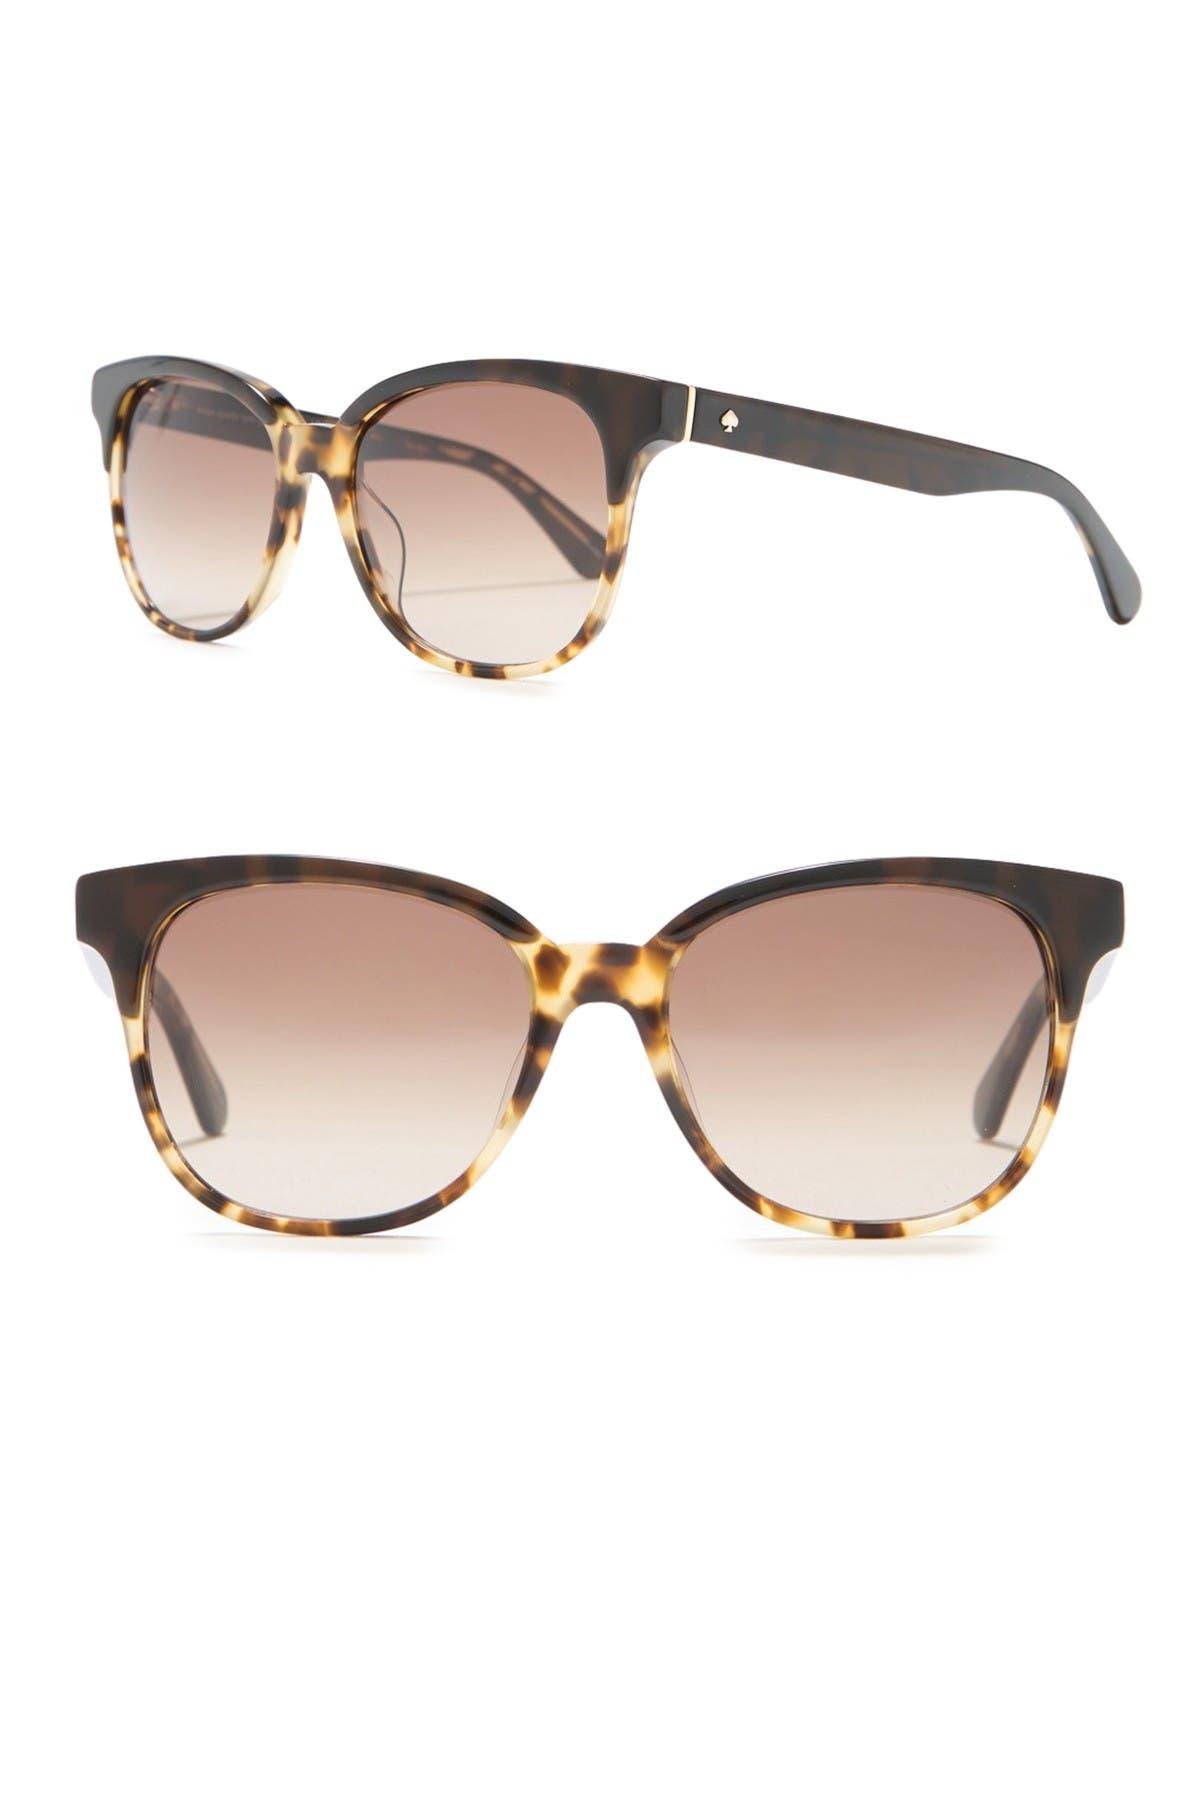 Image of kate spade new york arlynn 52mm square sunglasses